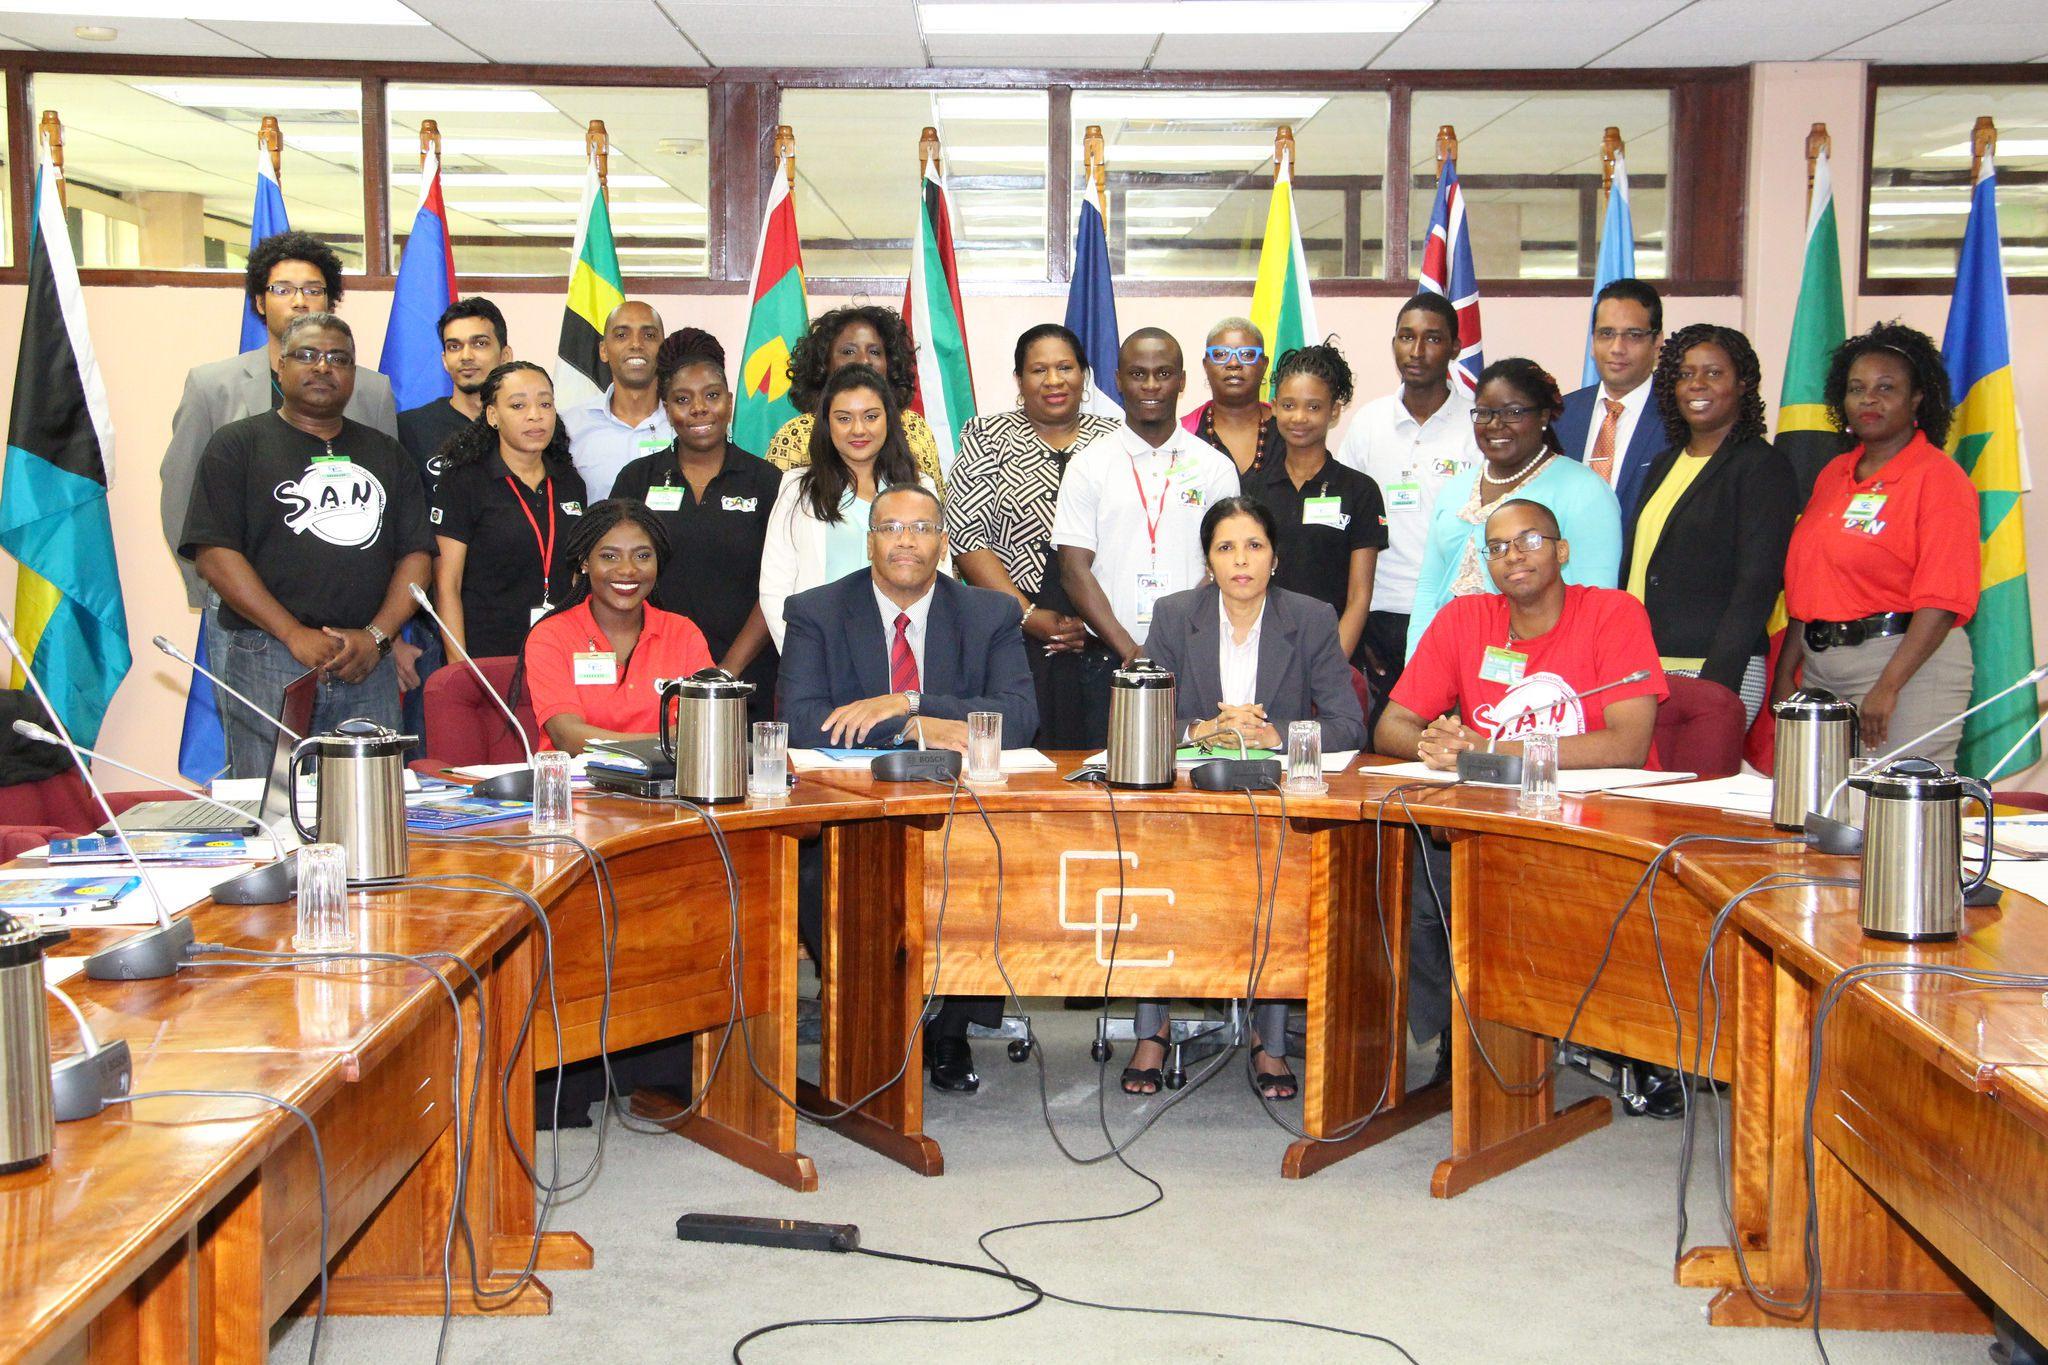 Amb. Manorma Soeknandan and Mr. Joseph Cox (seated, centre) with the visitors and CARICOM Secretariat staff members.